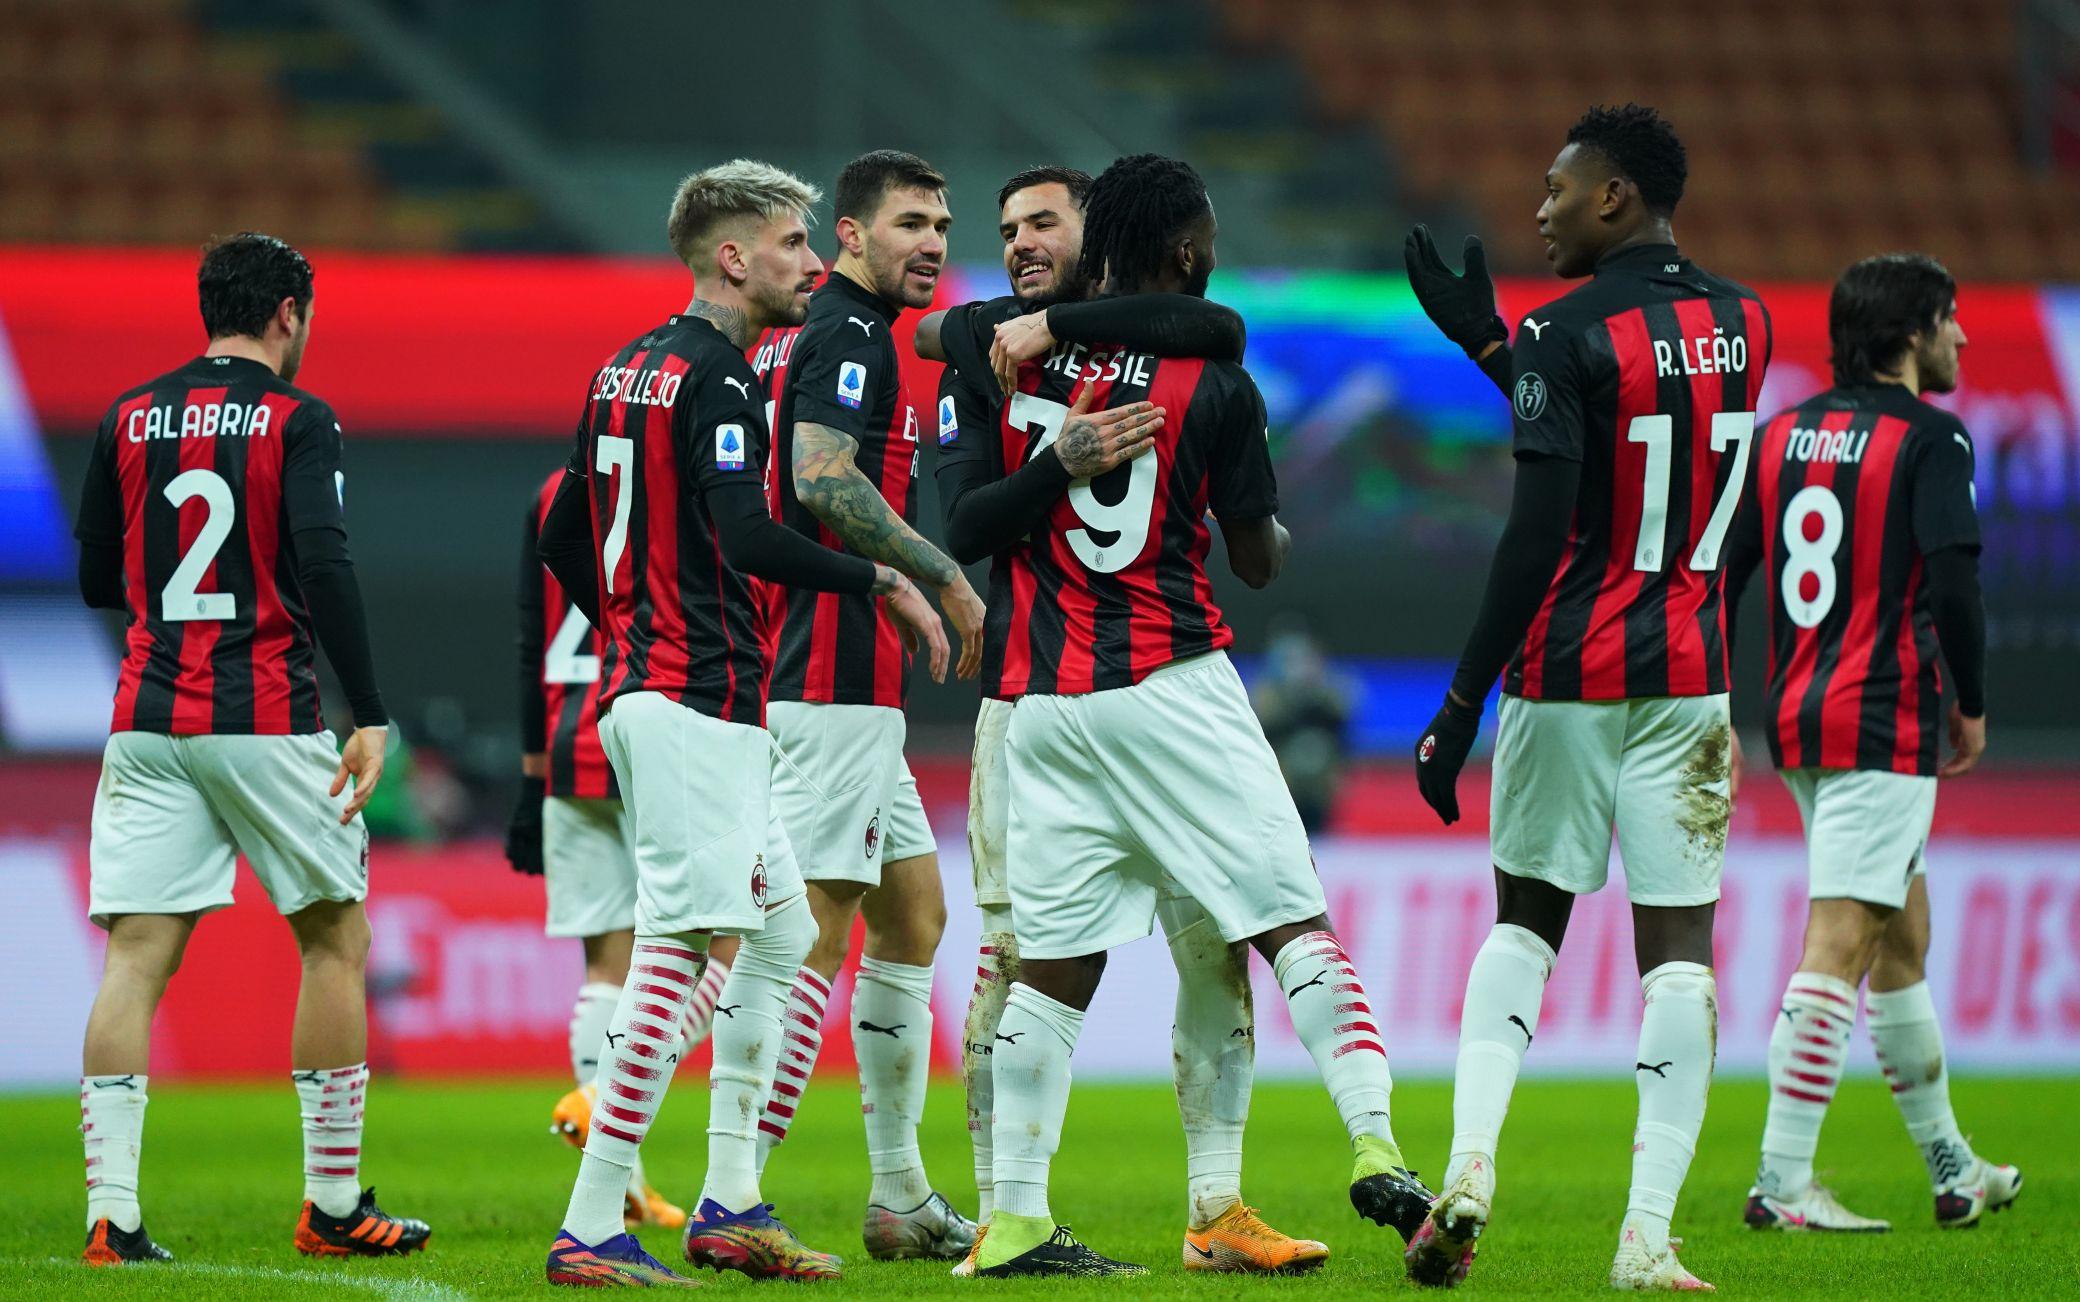 Milan Torino 2-0: gol e highlights della partita di Serie A | Sky Sport